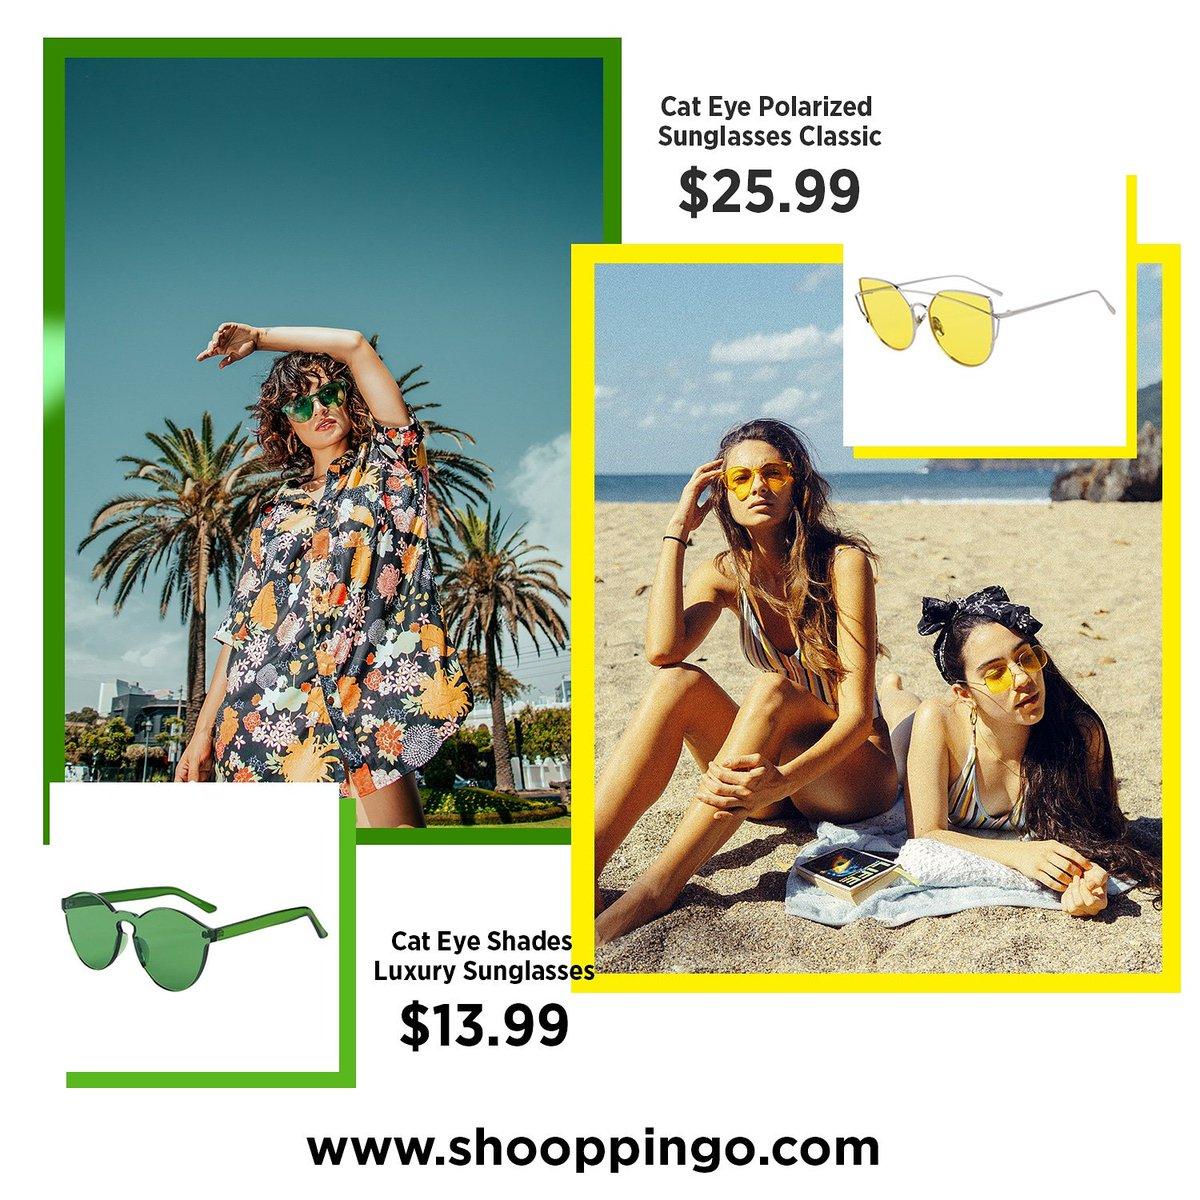 92b7f17bd9e Cat Eye Polarized Sunglasses  25.99 - Cat Eye Shades Luxury Sunglasses   13.99 For more http   www.shooppingo.com  summer  summertime  sun  hot   sunny  warm ...